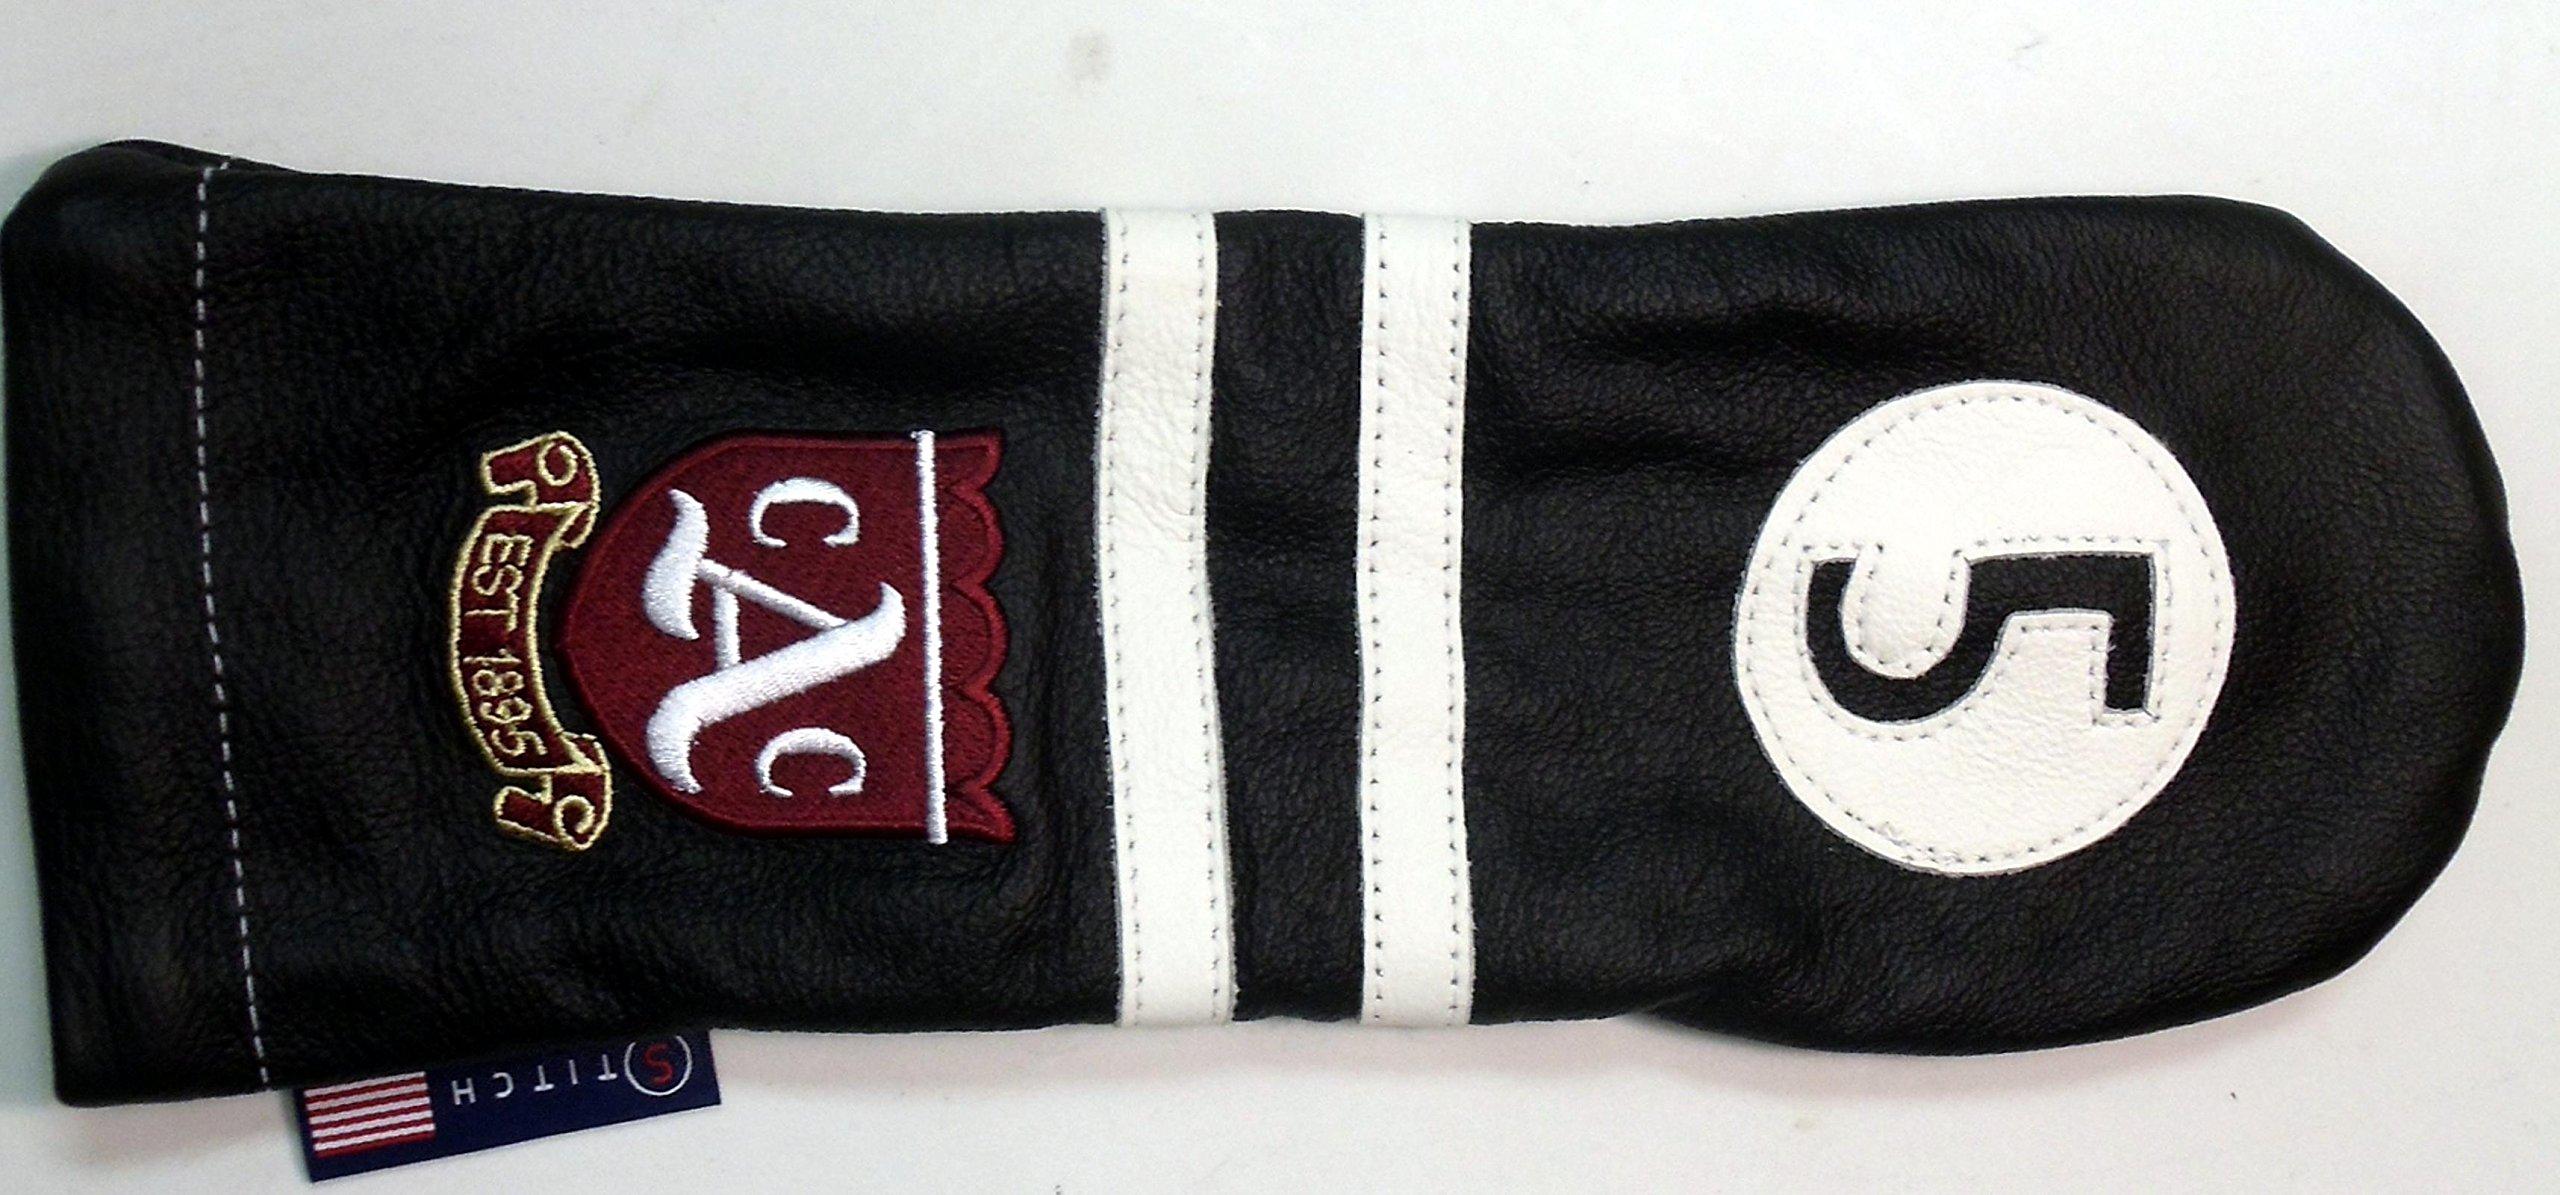 Stitch Golf Club Leather 5 FAIRWAY WOOD Headcover SAILING STRIPE Black logo US